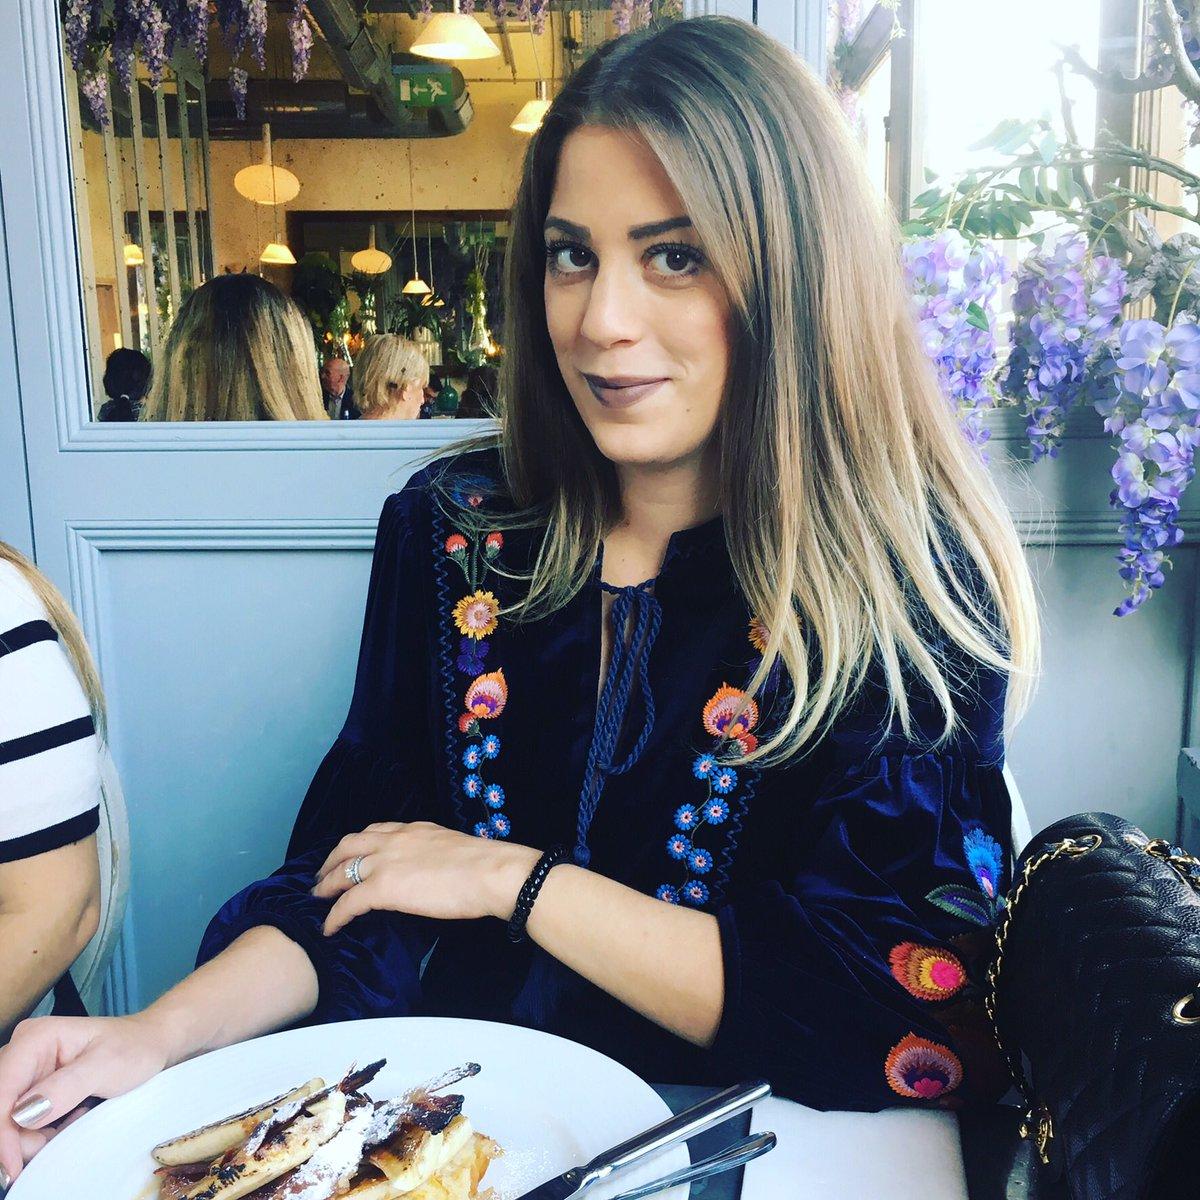 What lipstick are you wearing this season? Make sure it's @LOrealParisUK @Balmain  http://ontheroxlondon.blogspot.co.uk/2017/10/loreal-balmain-lipstick-glamazone.html… #lipstick #lorealxbalmain #loreal #glamazone #bblogger #beauty #beautyblog #musthave